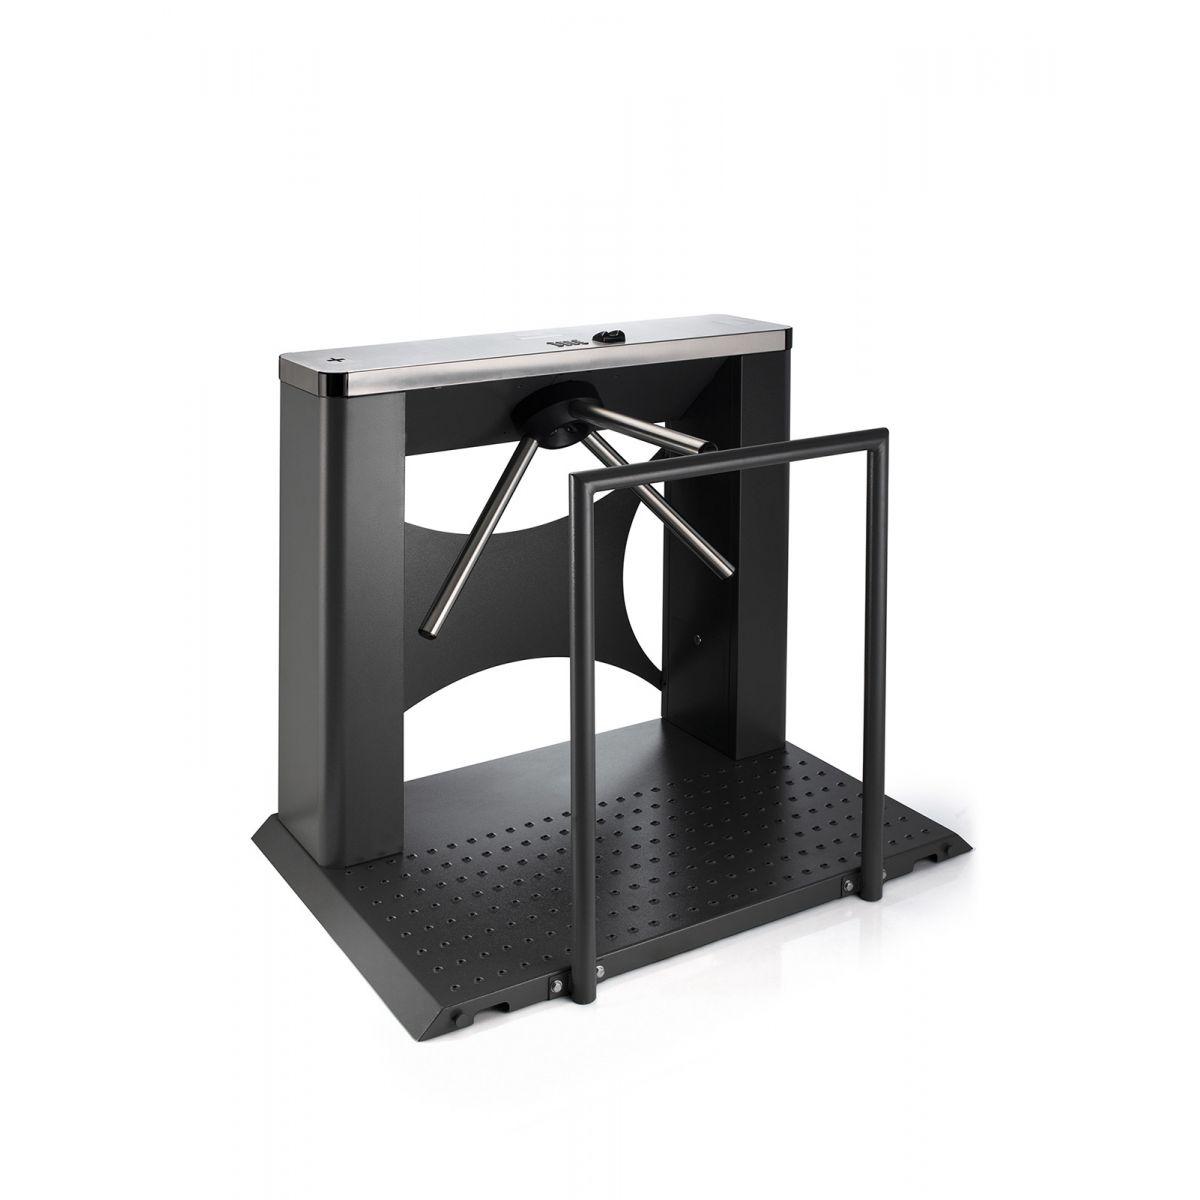 Catraca Box Topdata  - Iponto Tecnologia